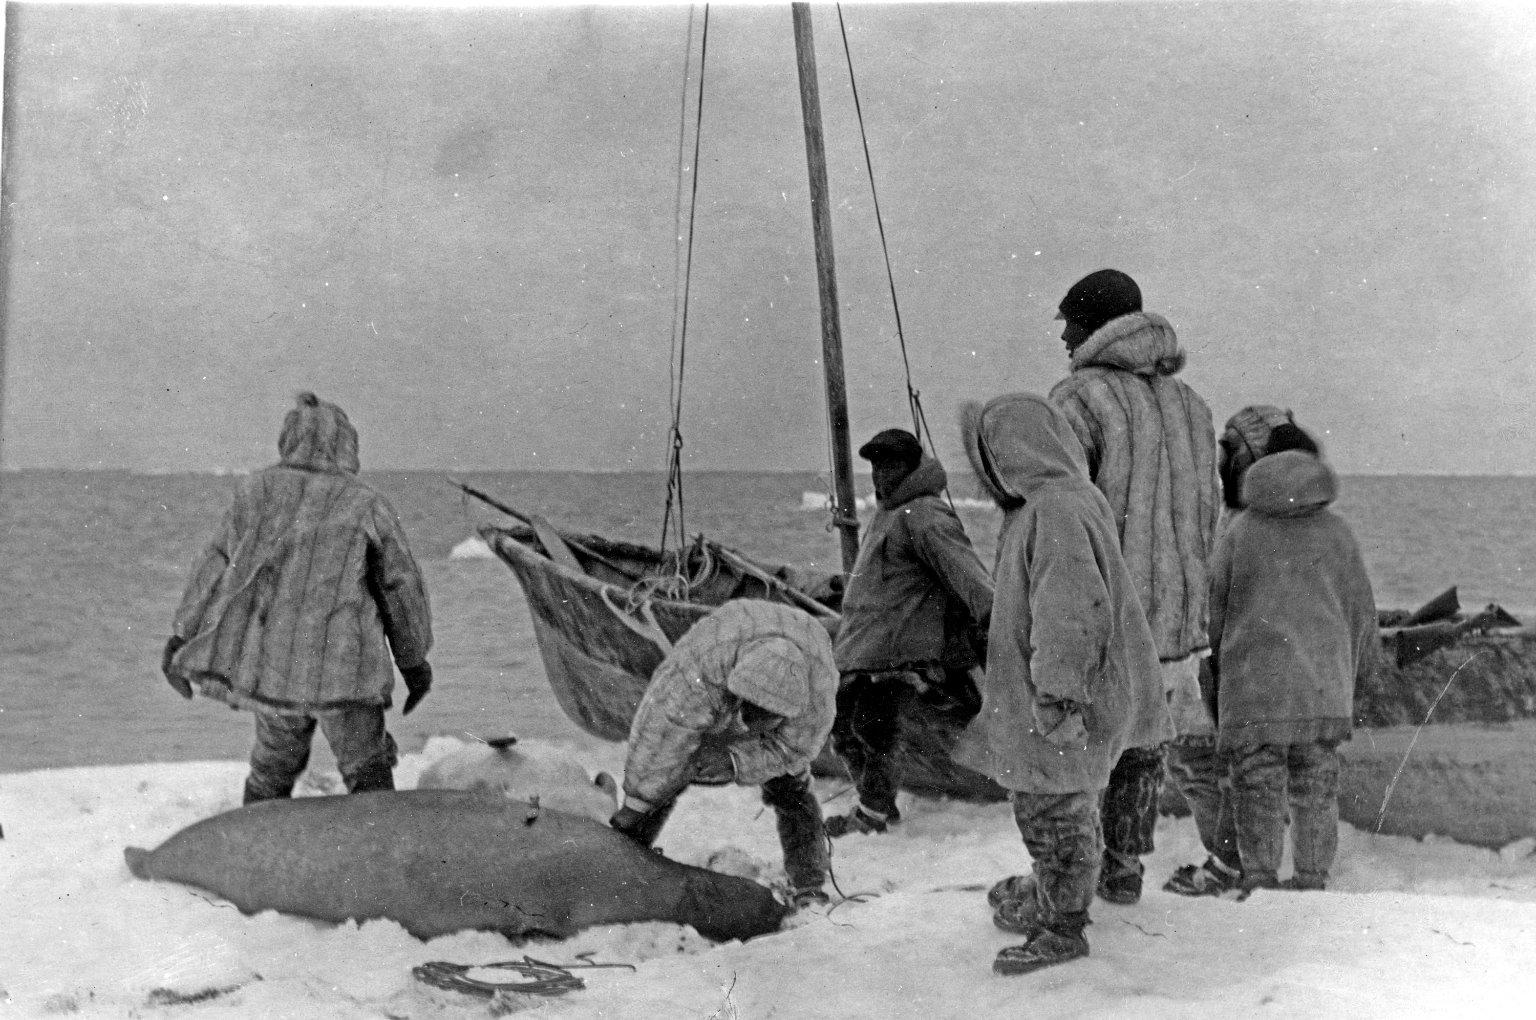 Alaskan hunters